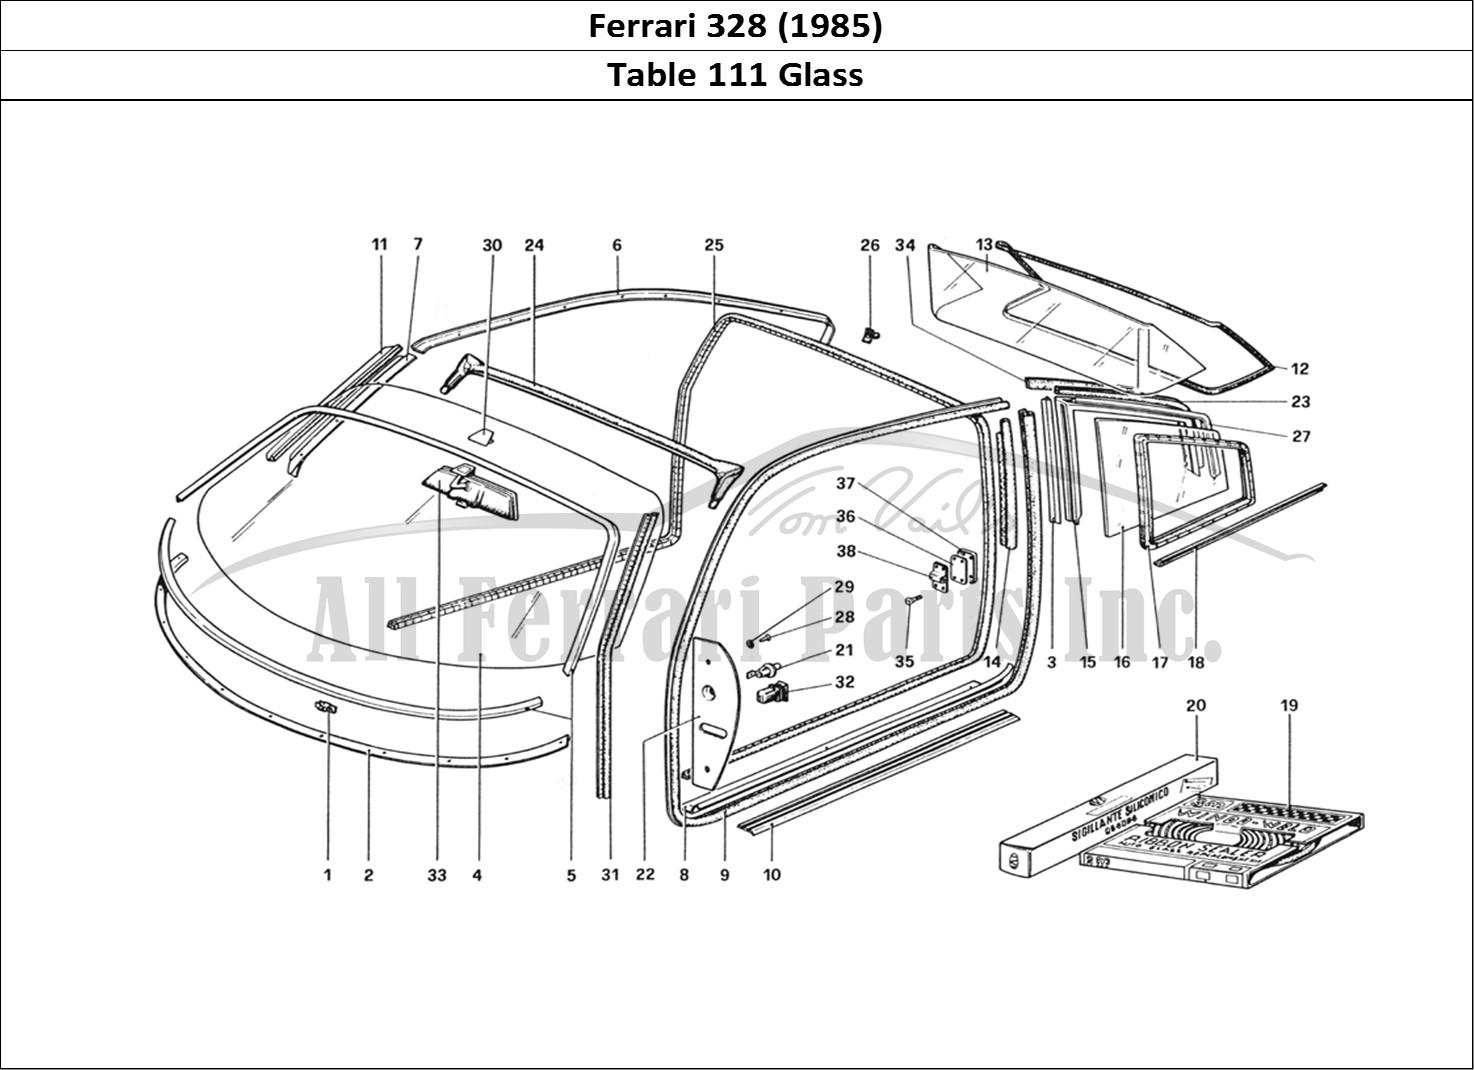 Buy original Ferrari 328 (1985) 111 Glass Ferrari parts